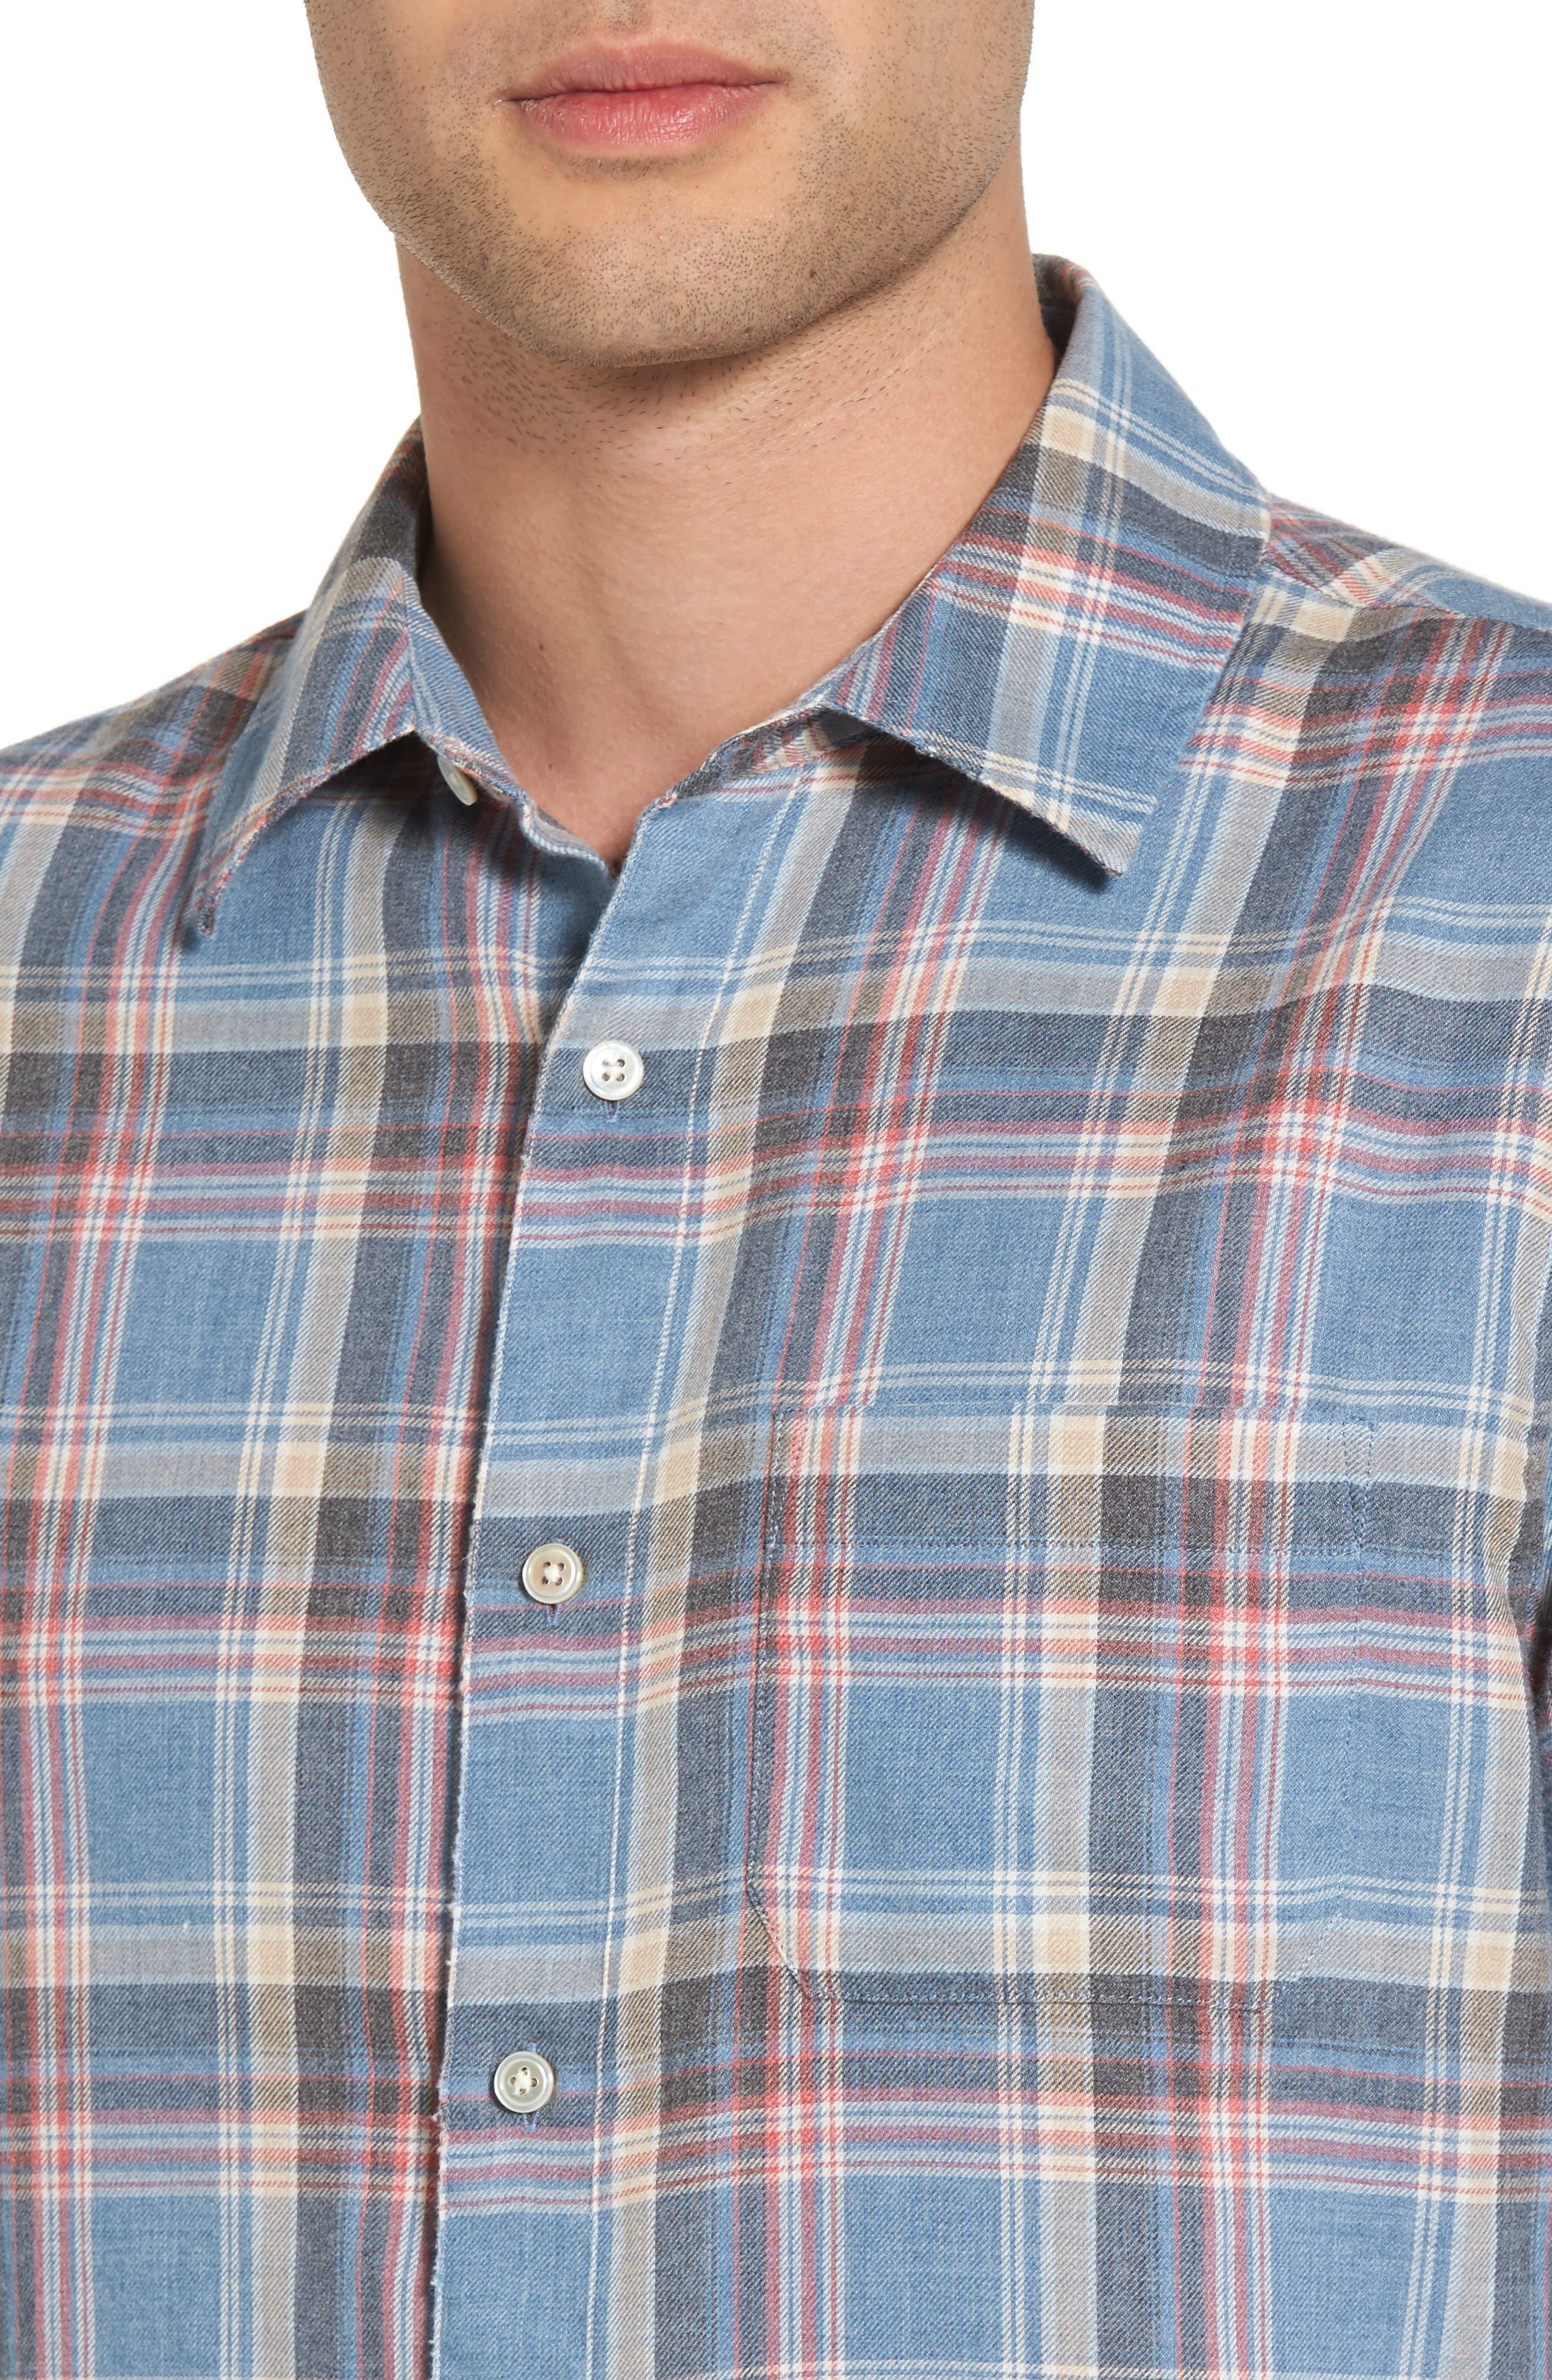 Fray Hem Plaid Flannel Shirt,                             Alternate thumbnail 4, color,                             401